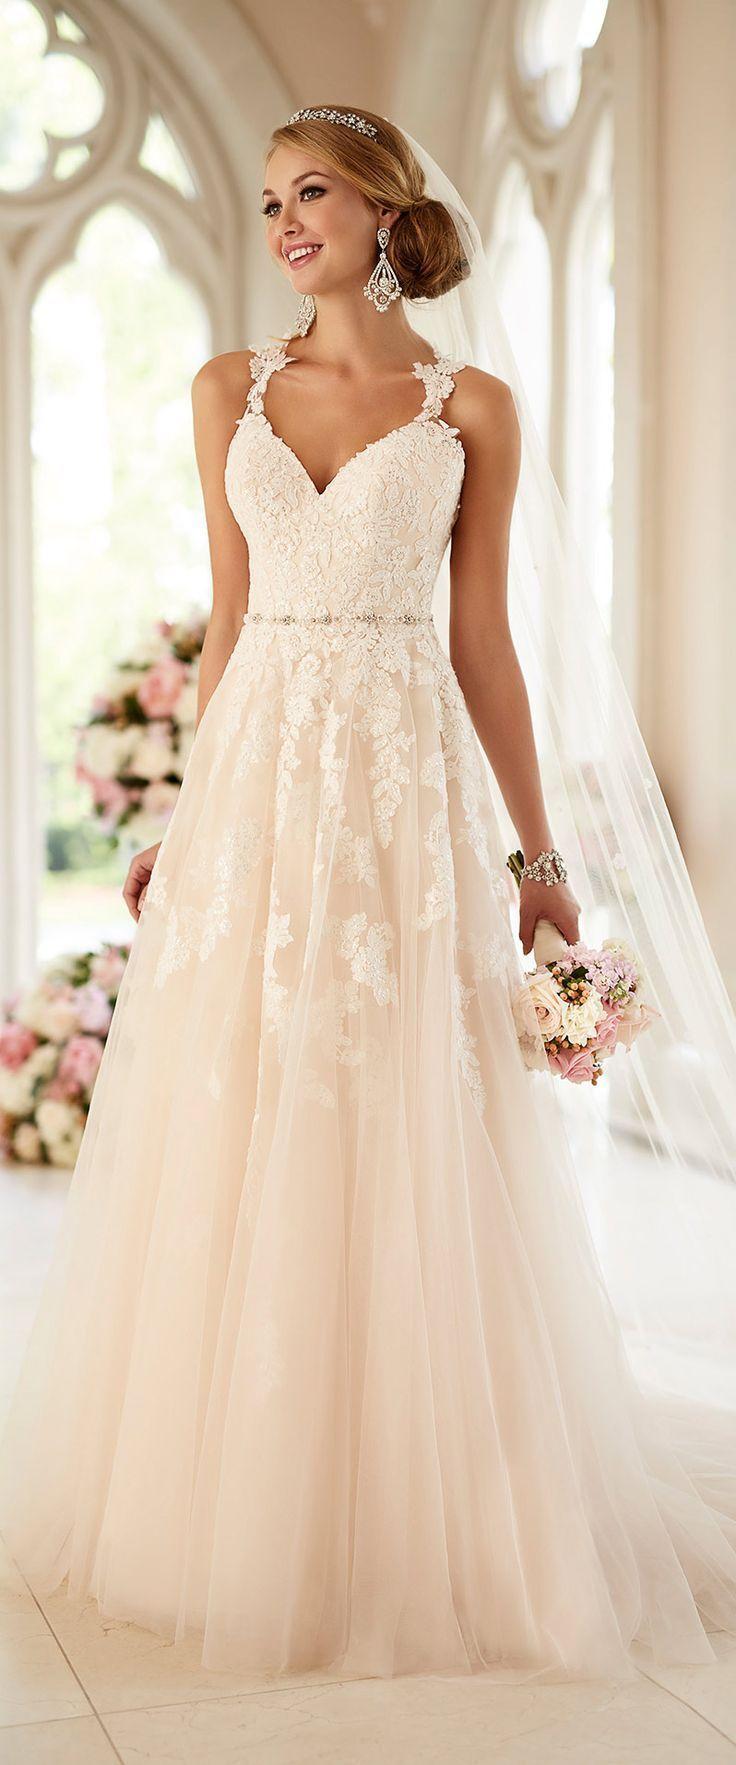 Wedding - 5. Wedding Dresses